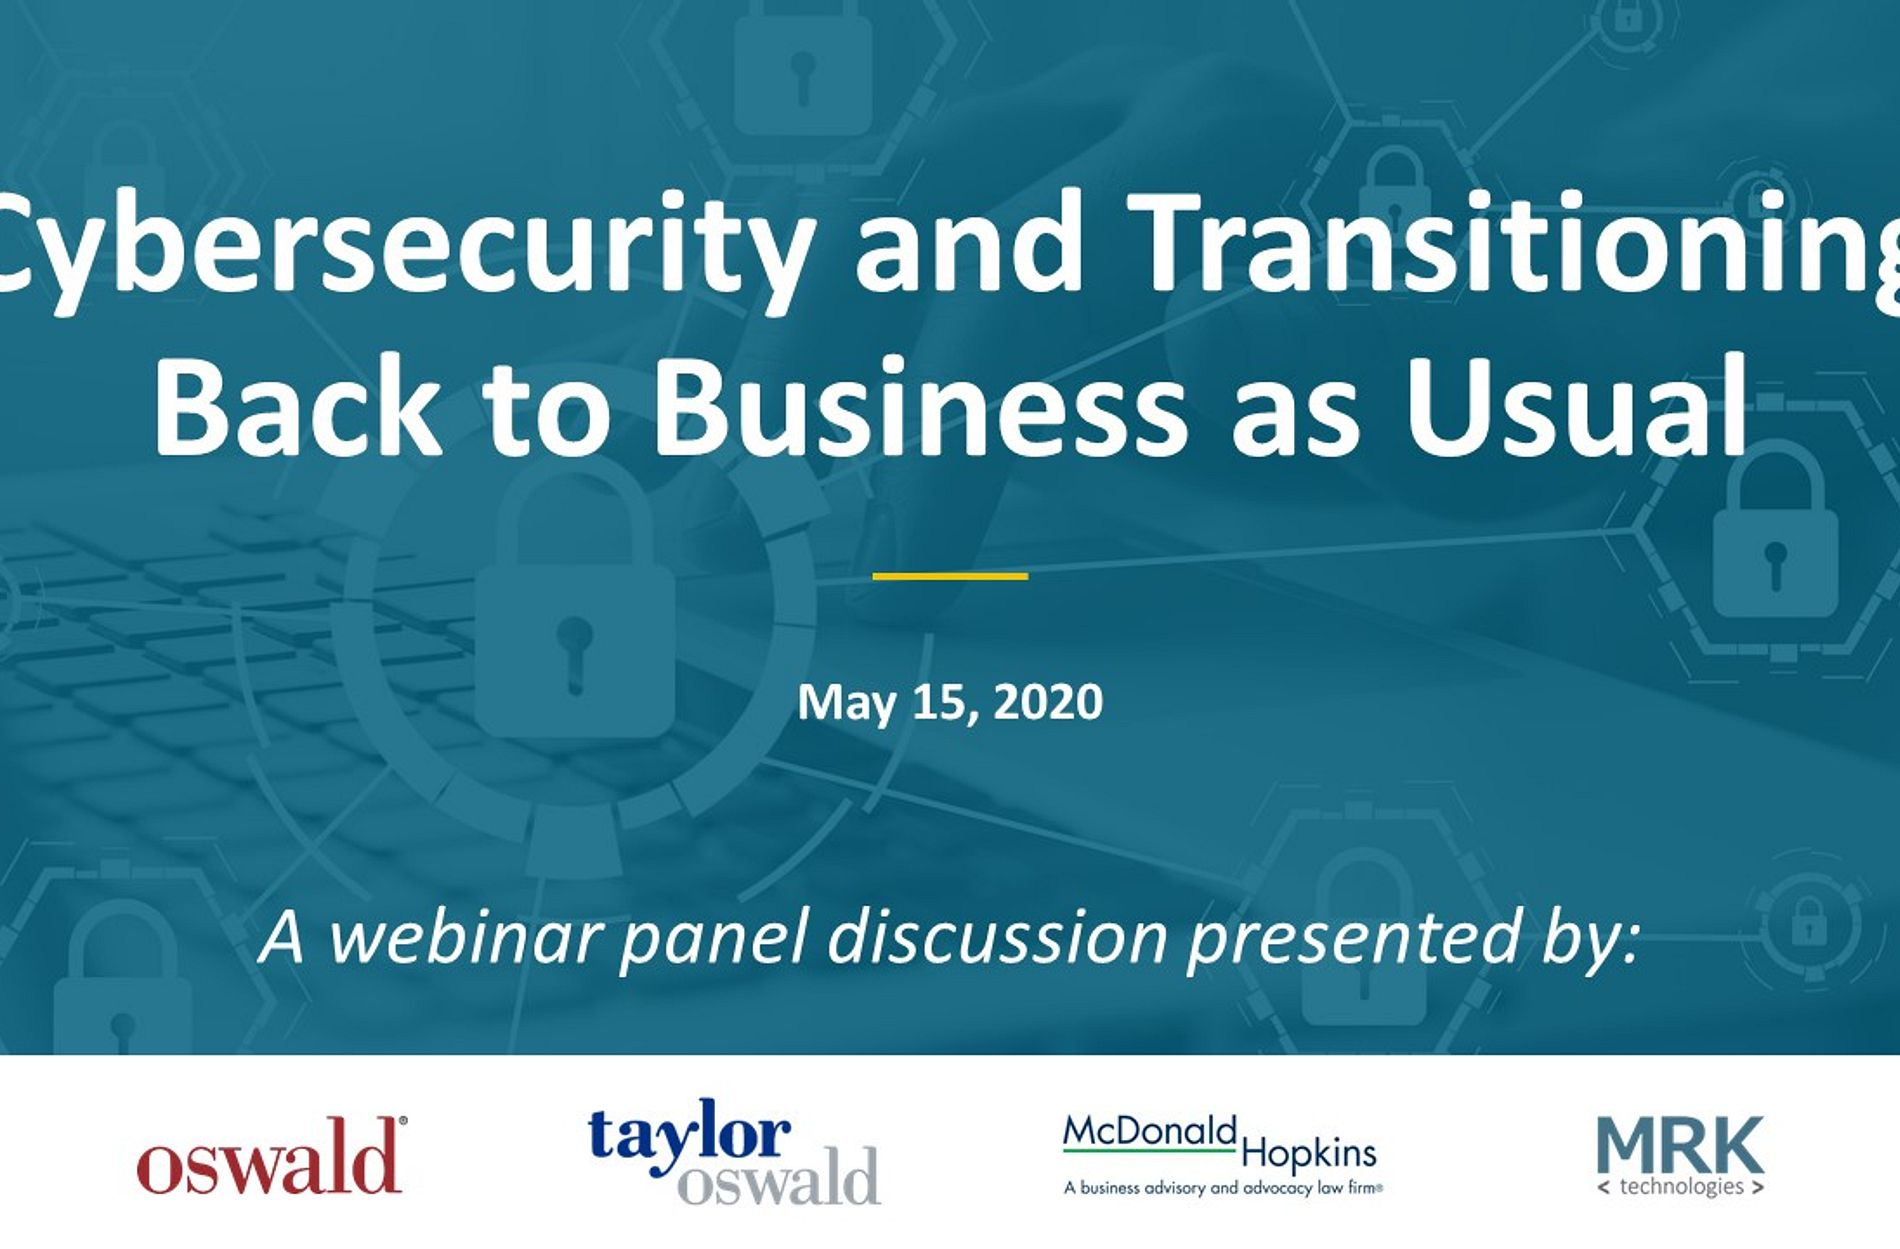 Cybersecurity Webinar May 15